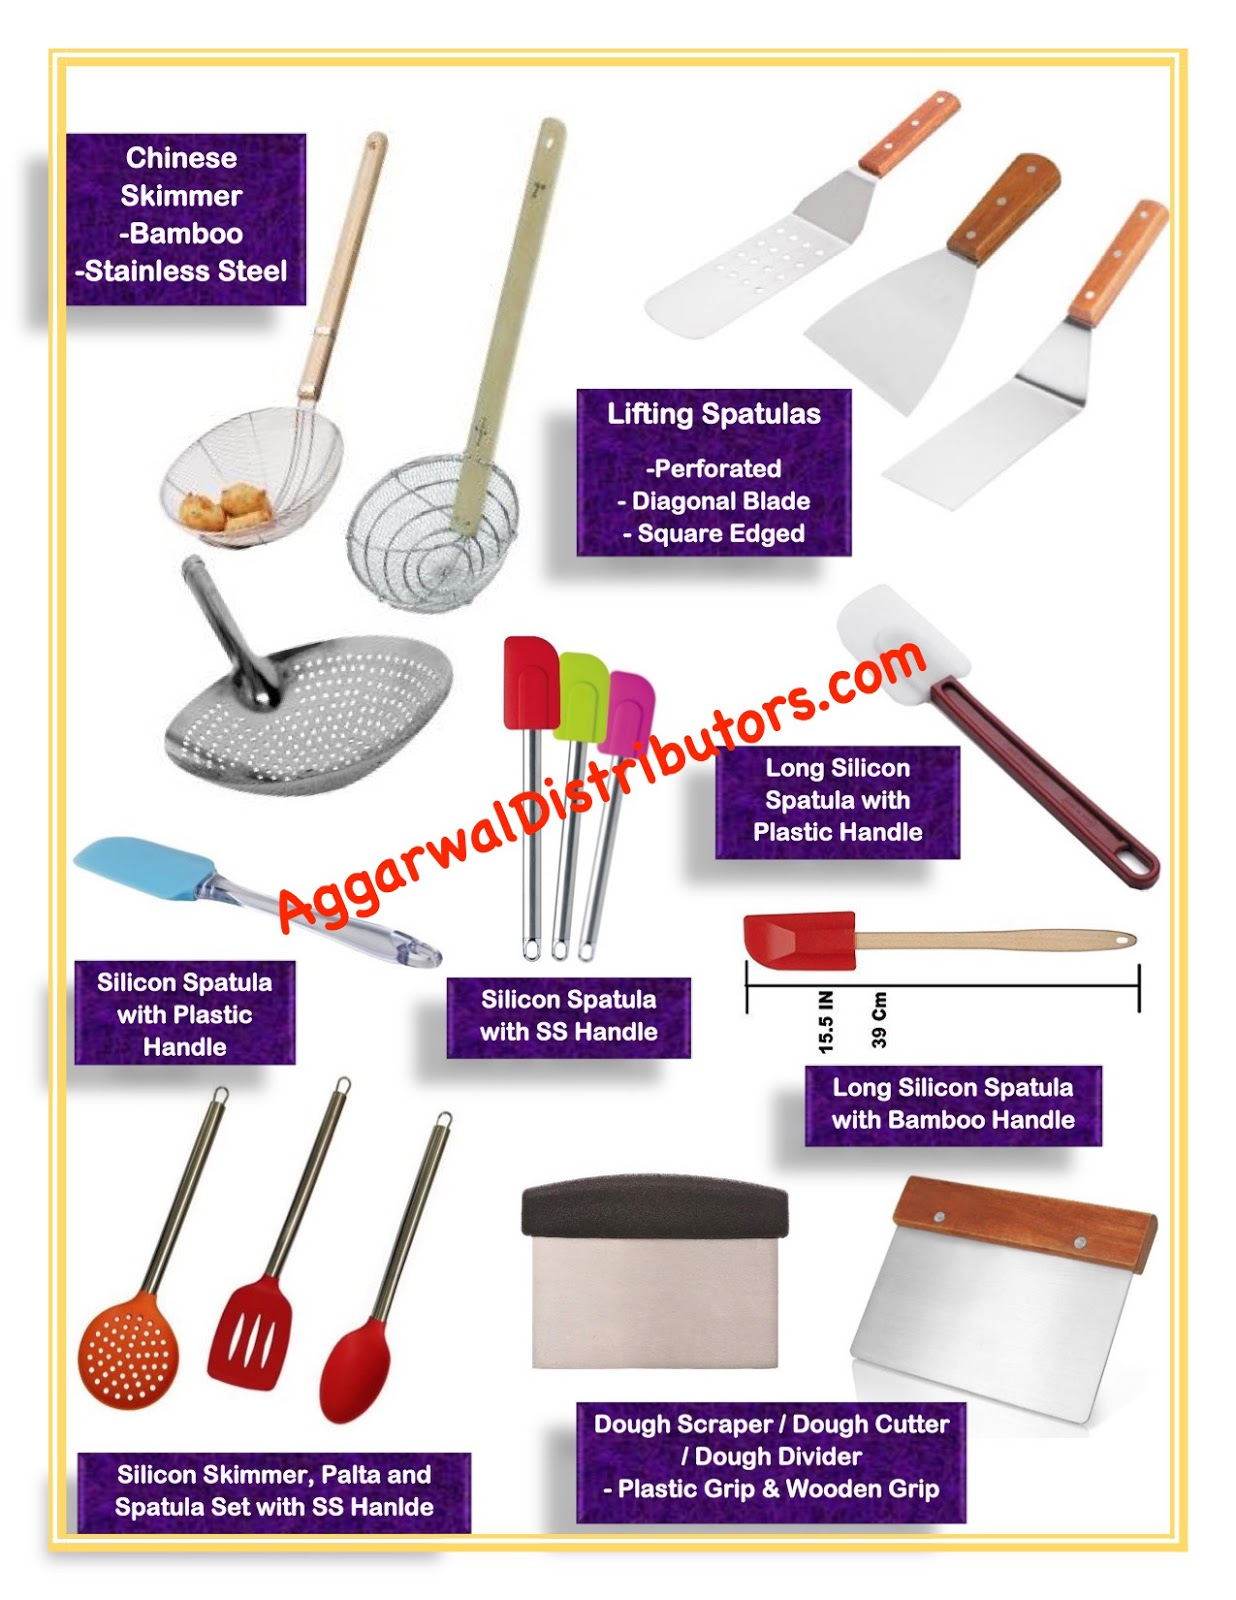 Aggarwal Distributors Kitchen Utensils & Machines